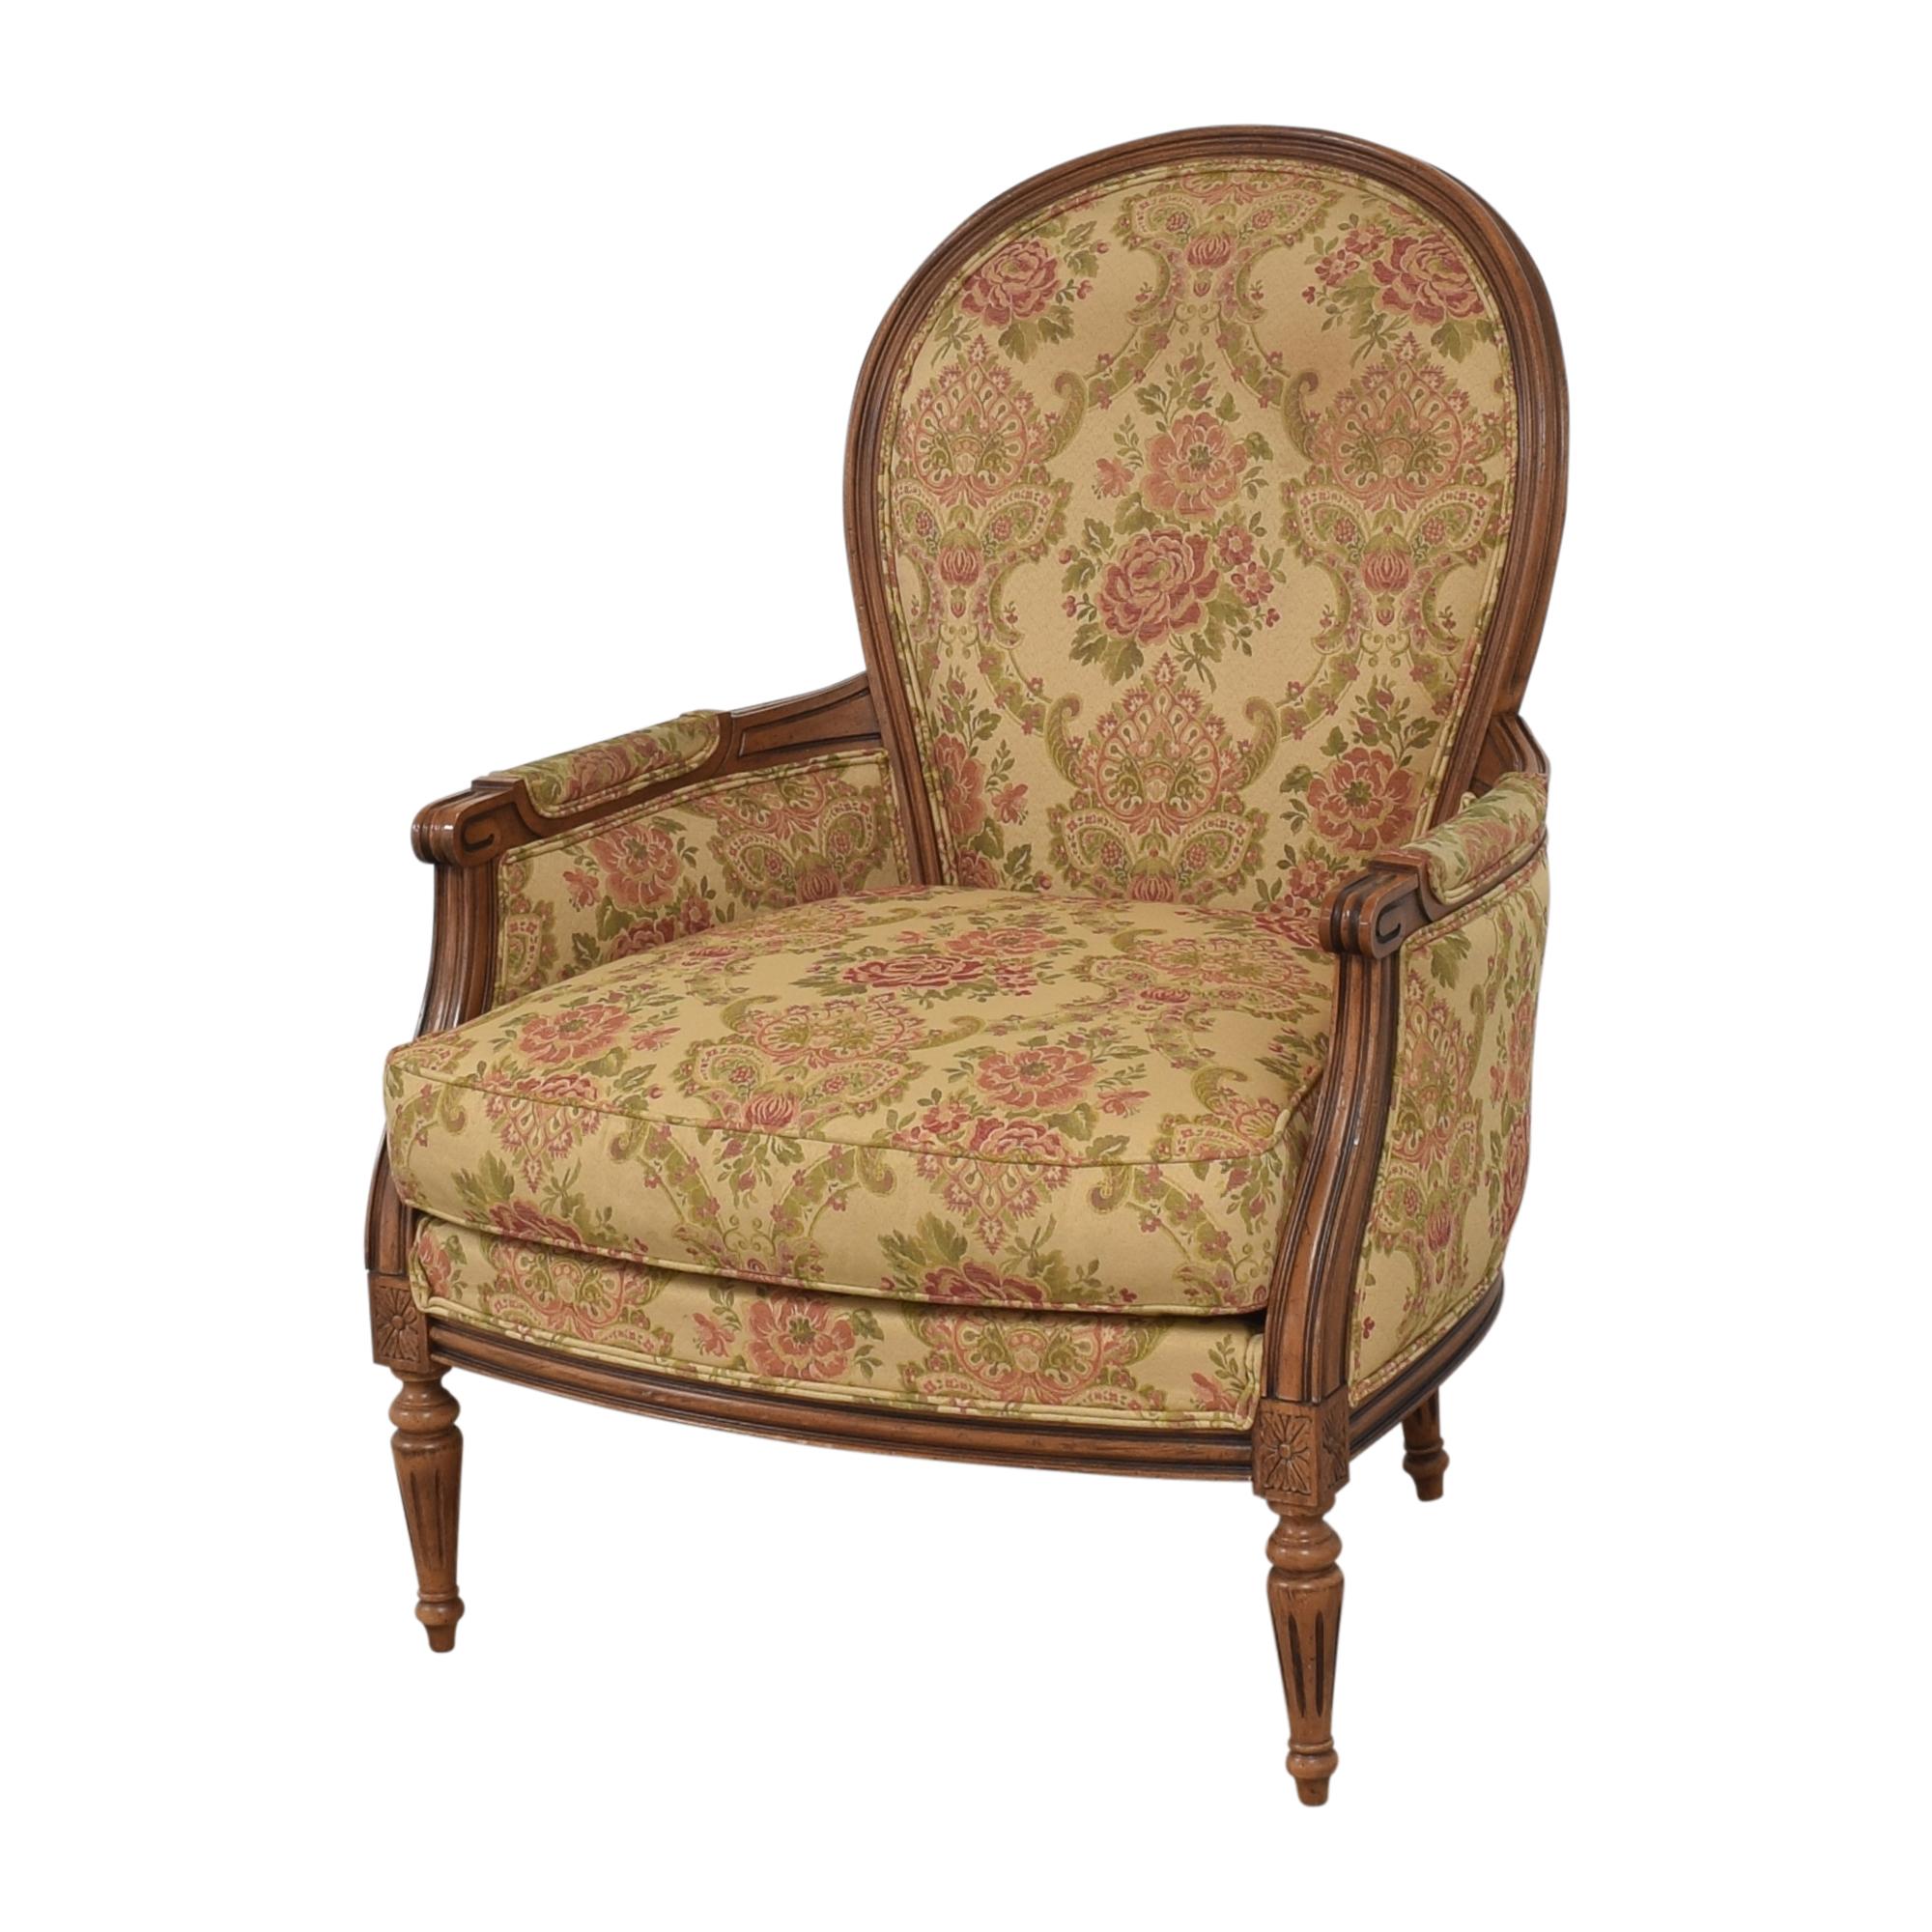 Ethan Allen Ethan Allen Suzette Accent Chair